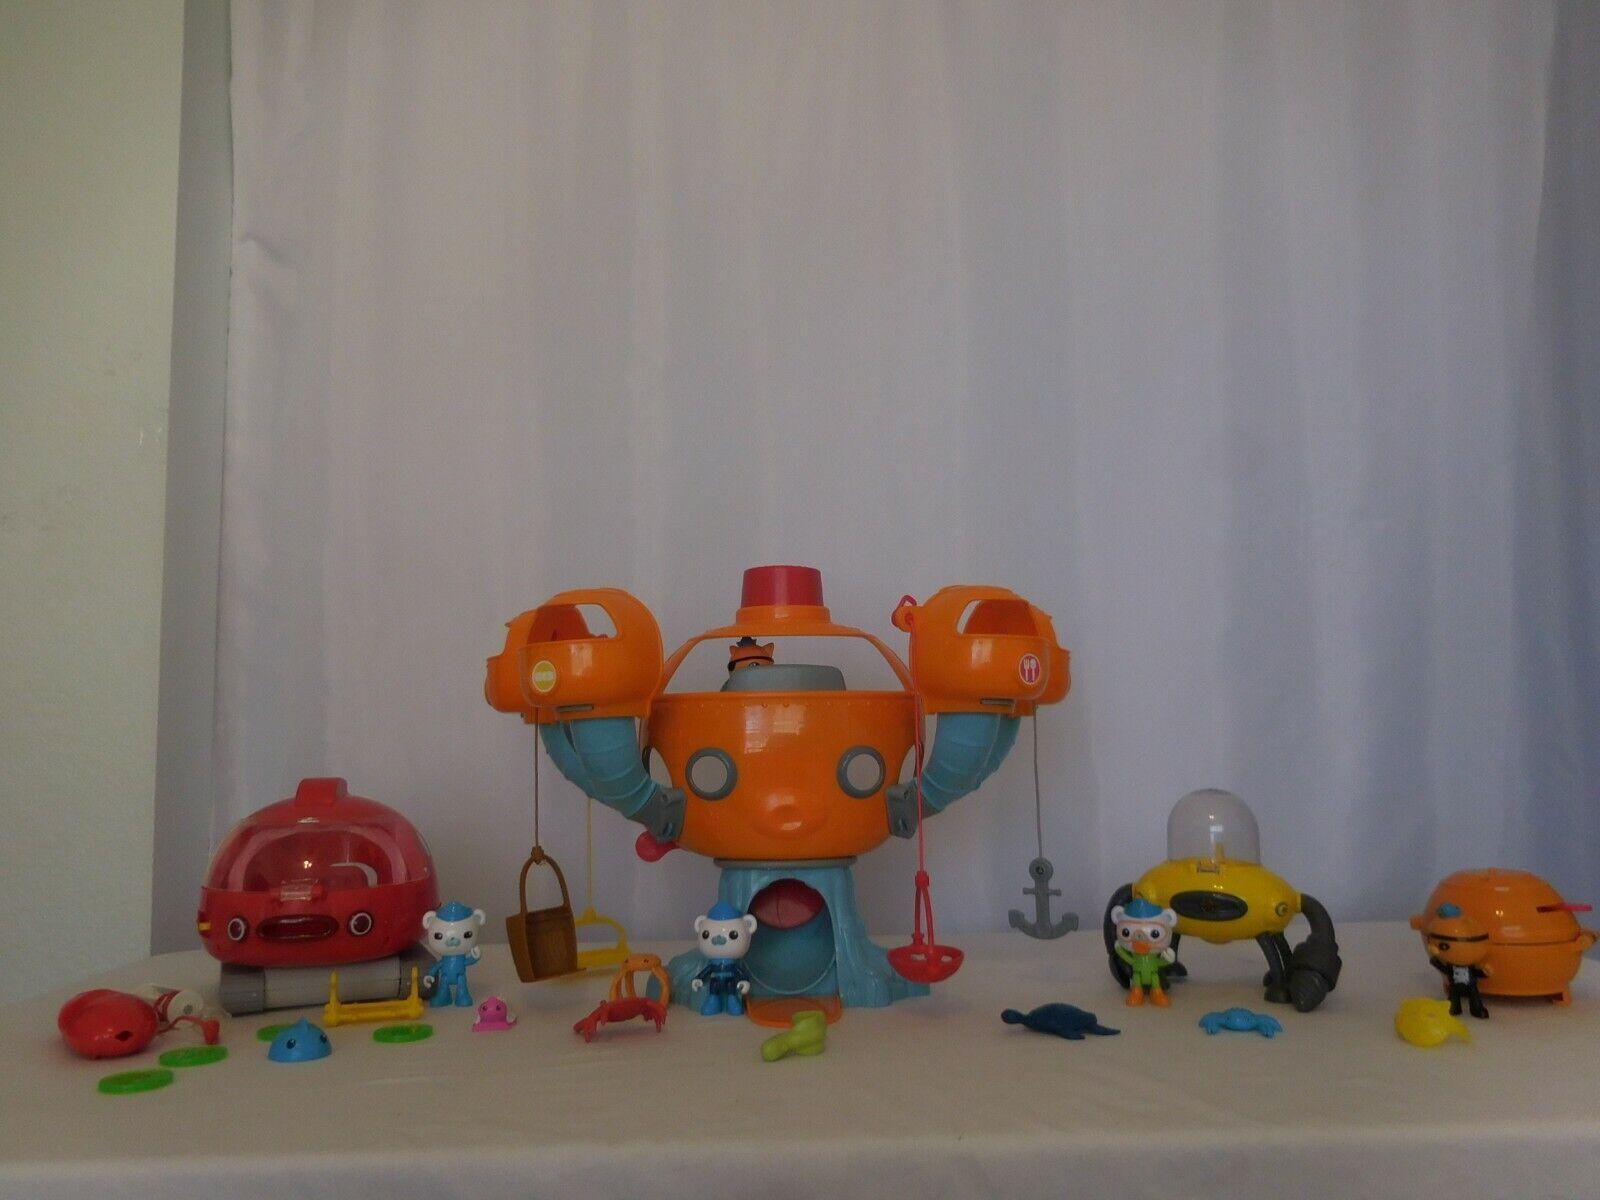 Fisher Price Octonauts Octopod Play Set Talking Sounds